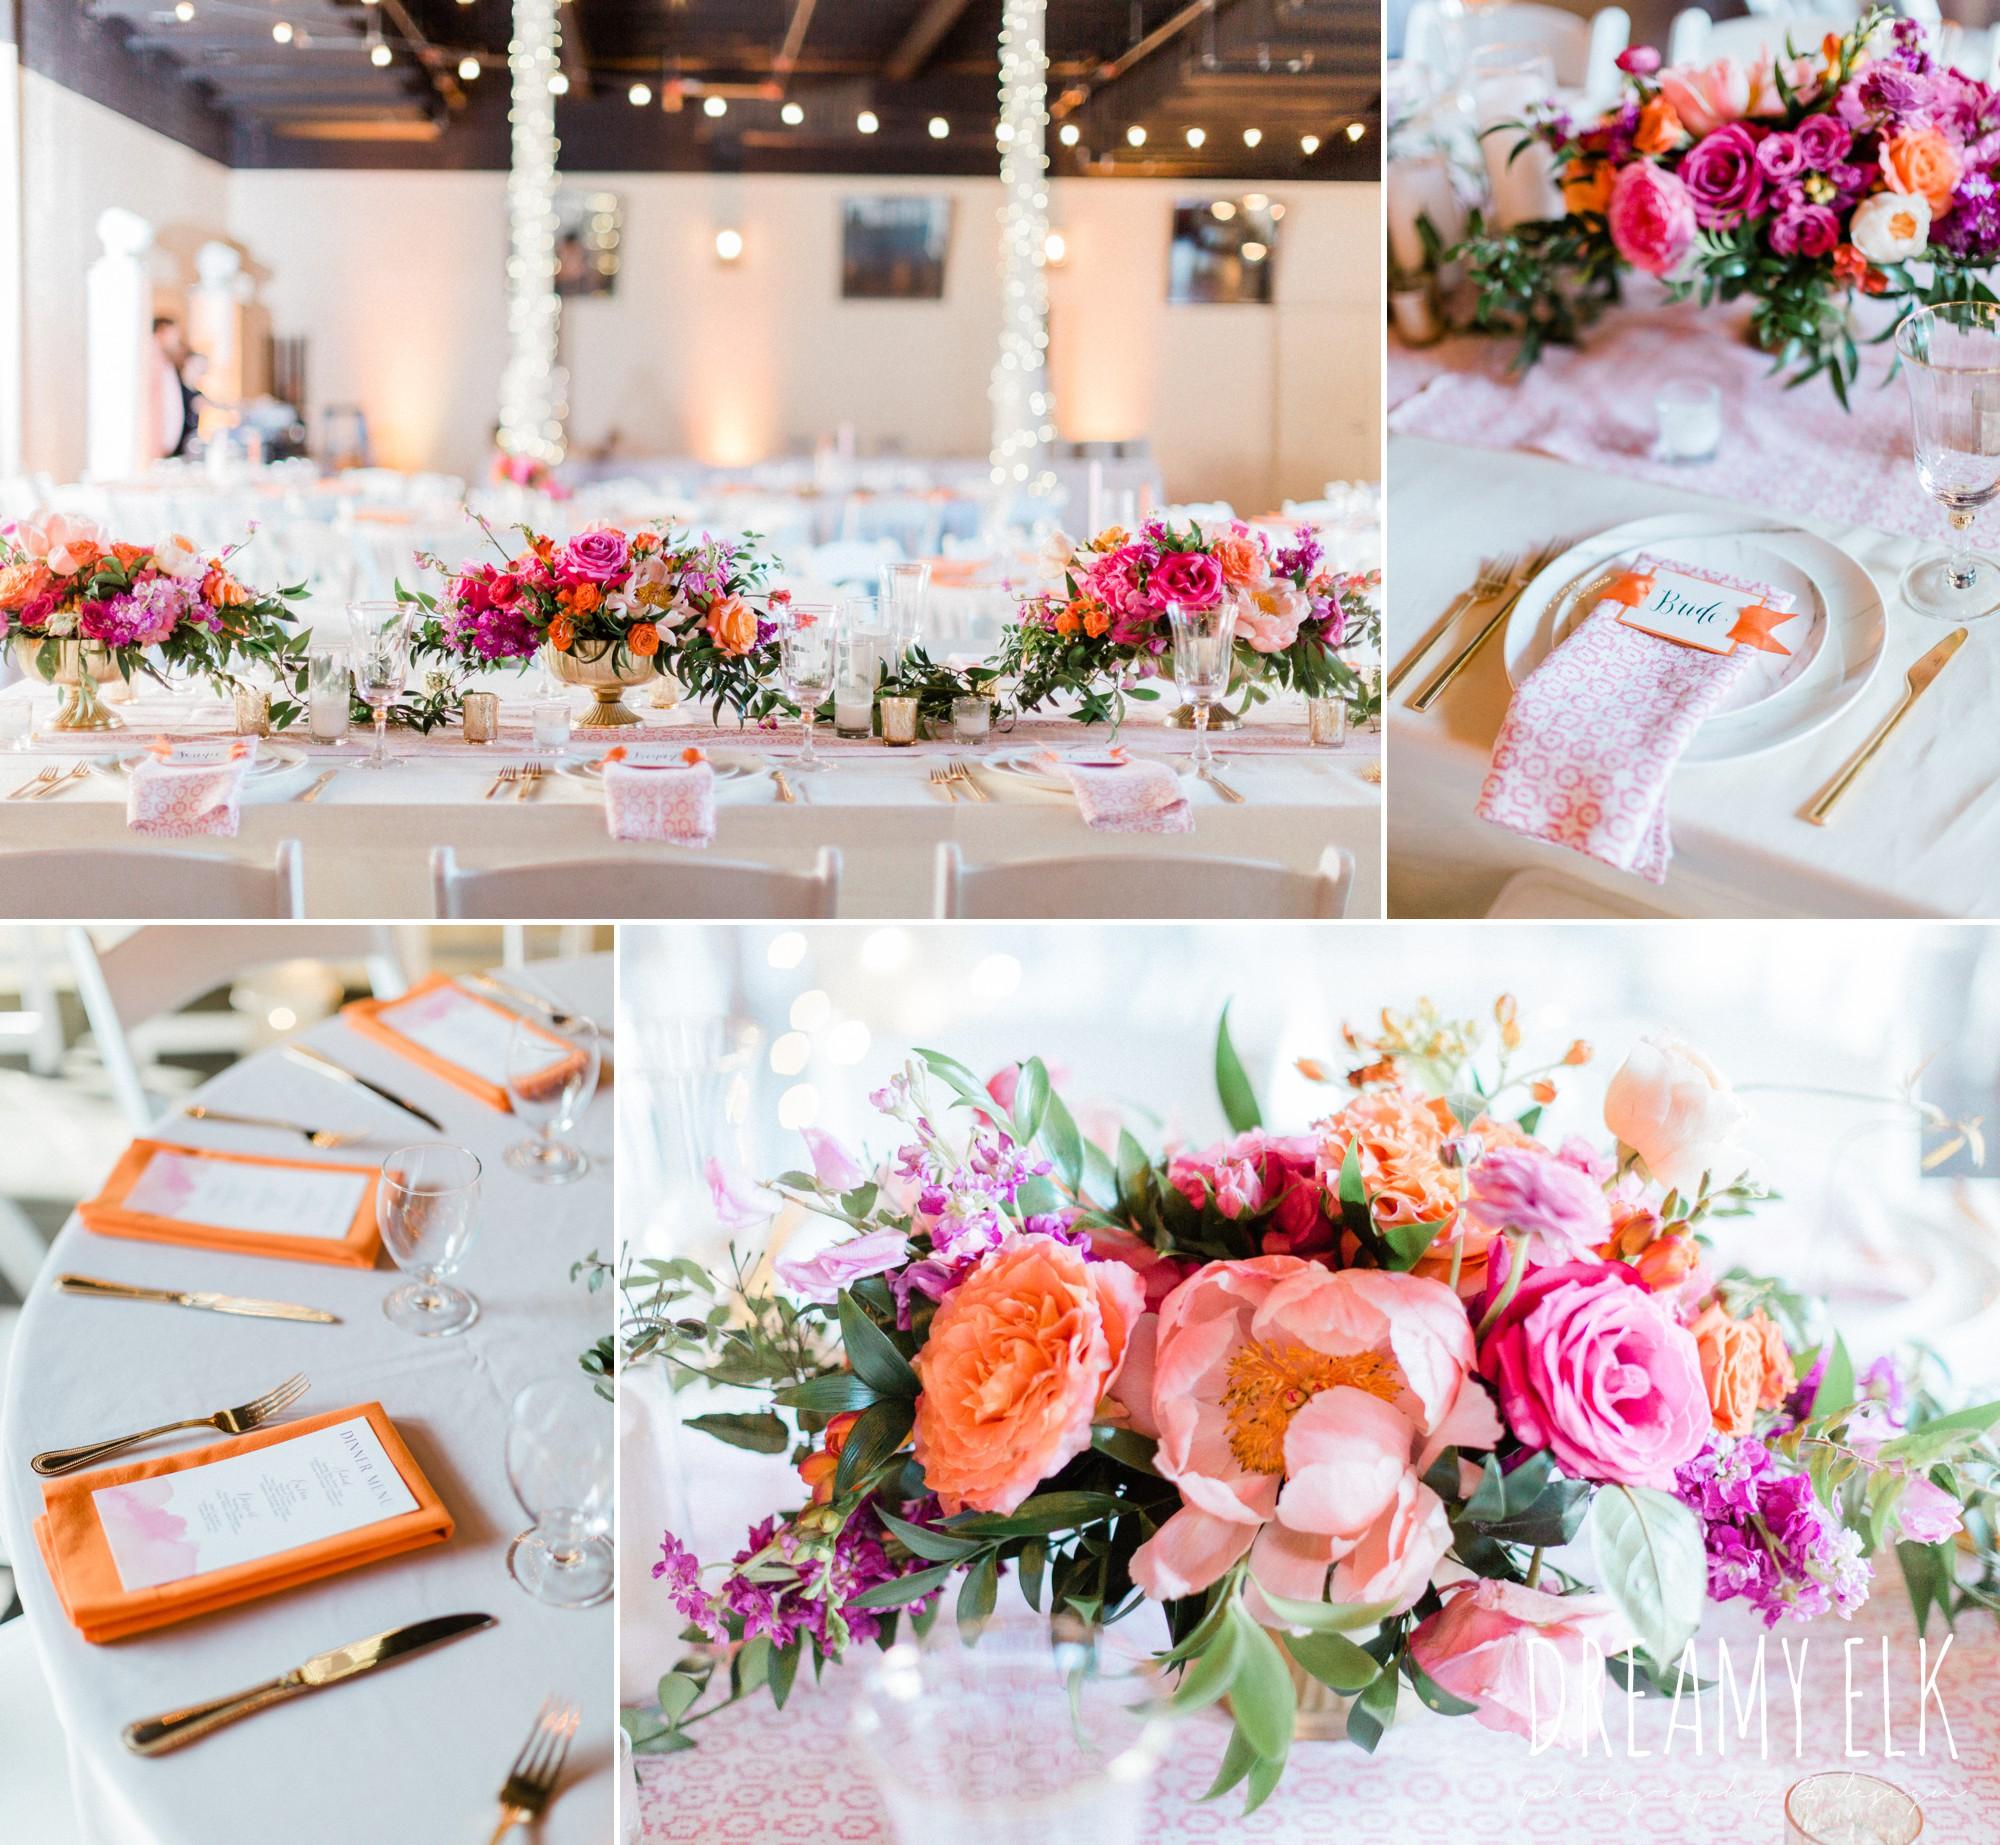 reception decor, spring colorful pink orange wedding photo, fort worth, texas, dreamy elk photography and design, jen rios weddings, kate foley designs